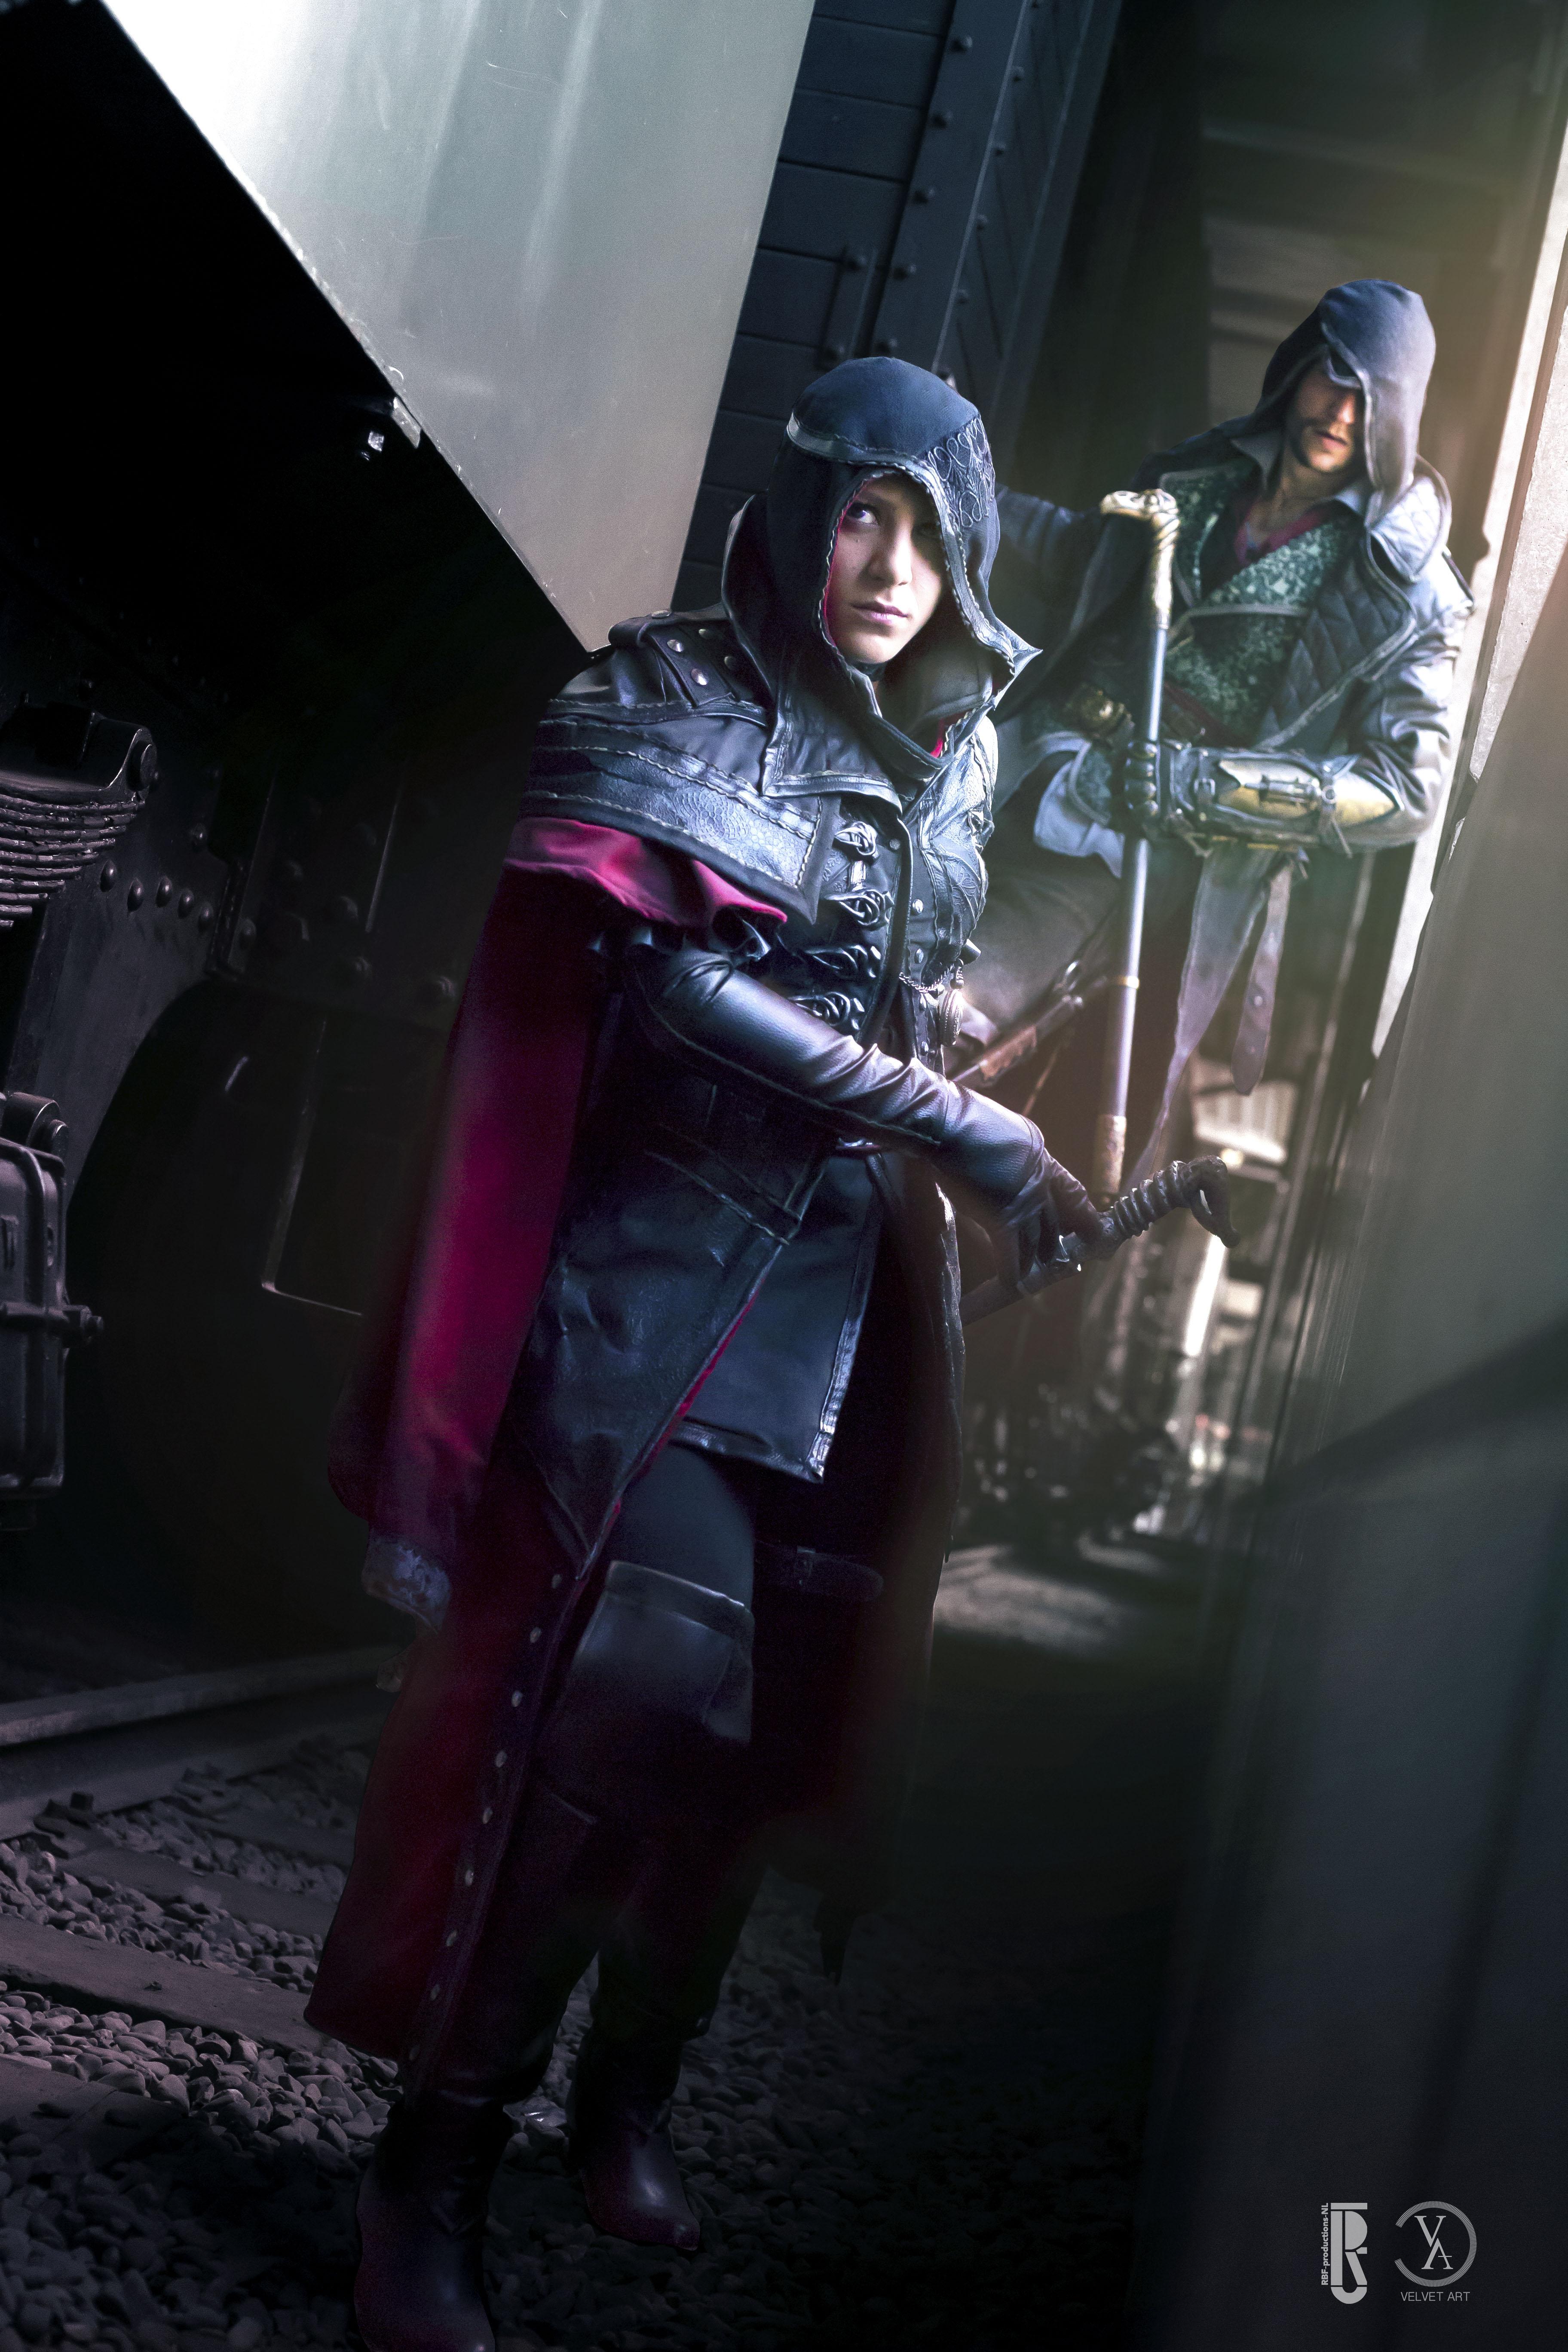 Assassin S Creed Syndicate Jacob Evie 03 Velvet Art Online Store Powered By Storenvy